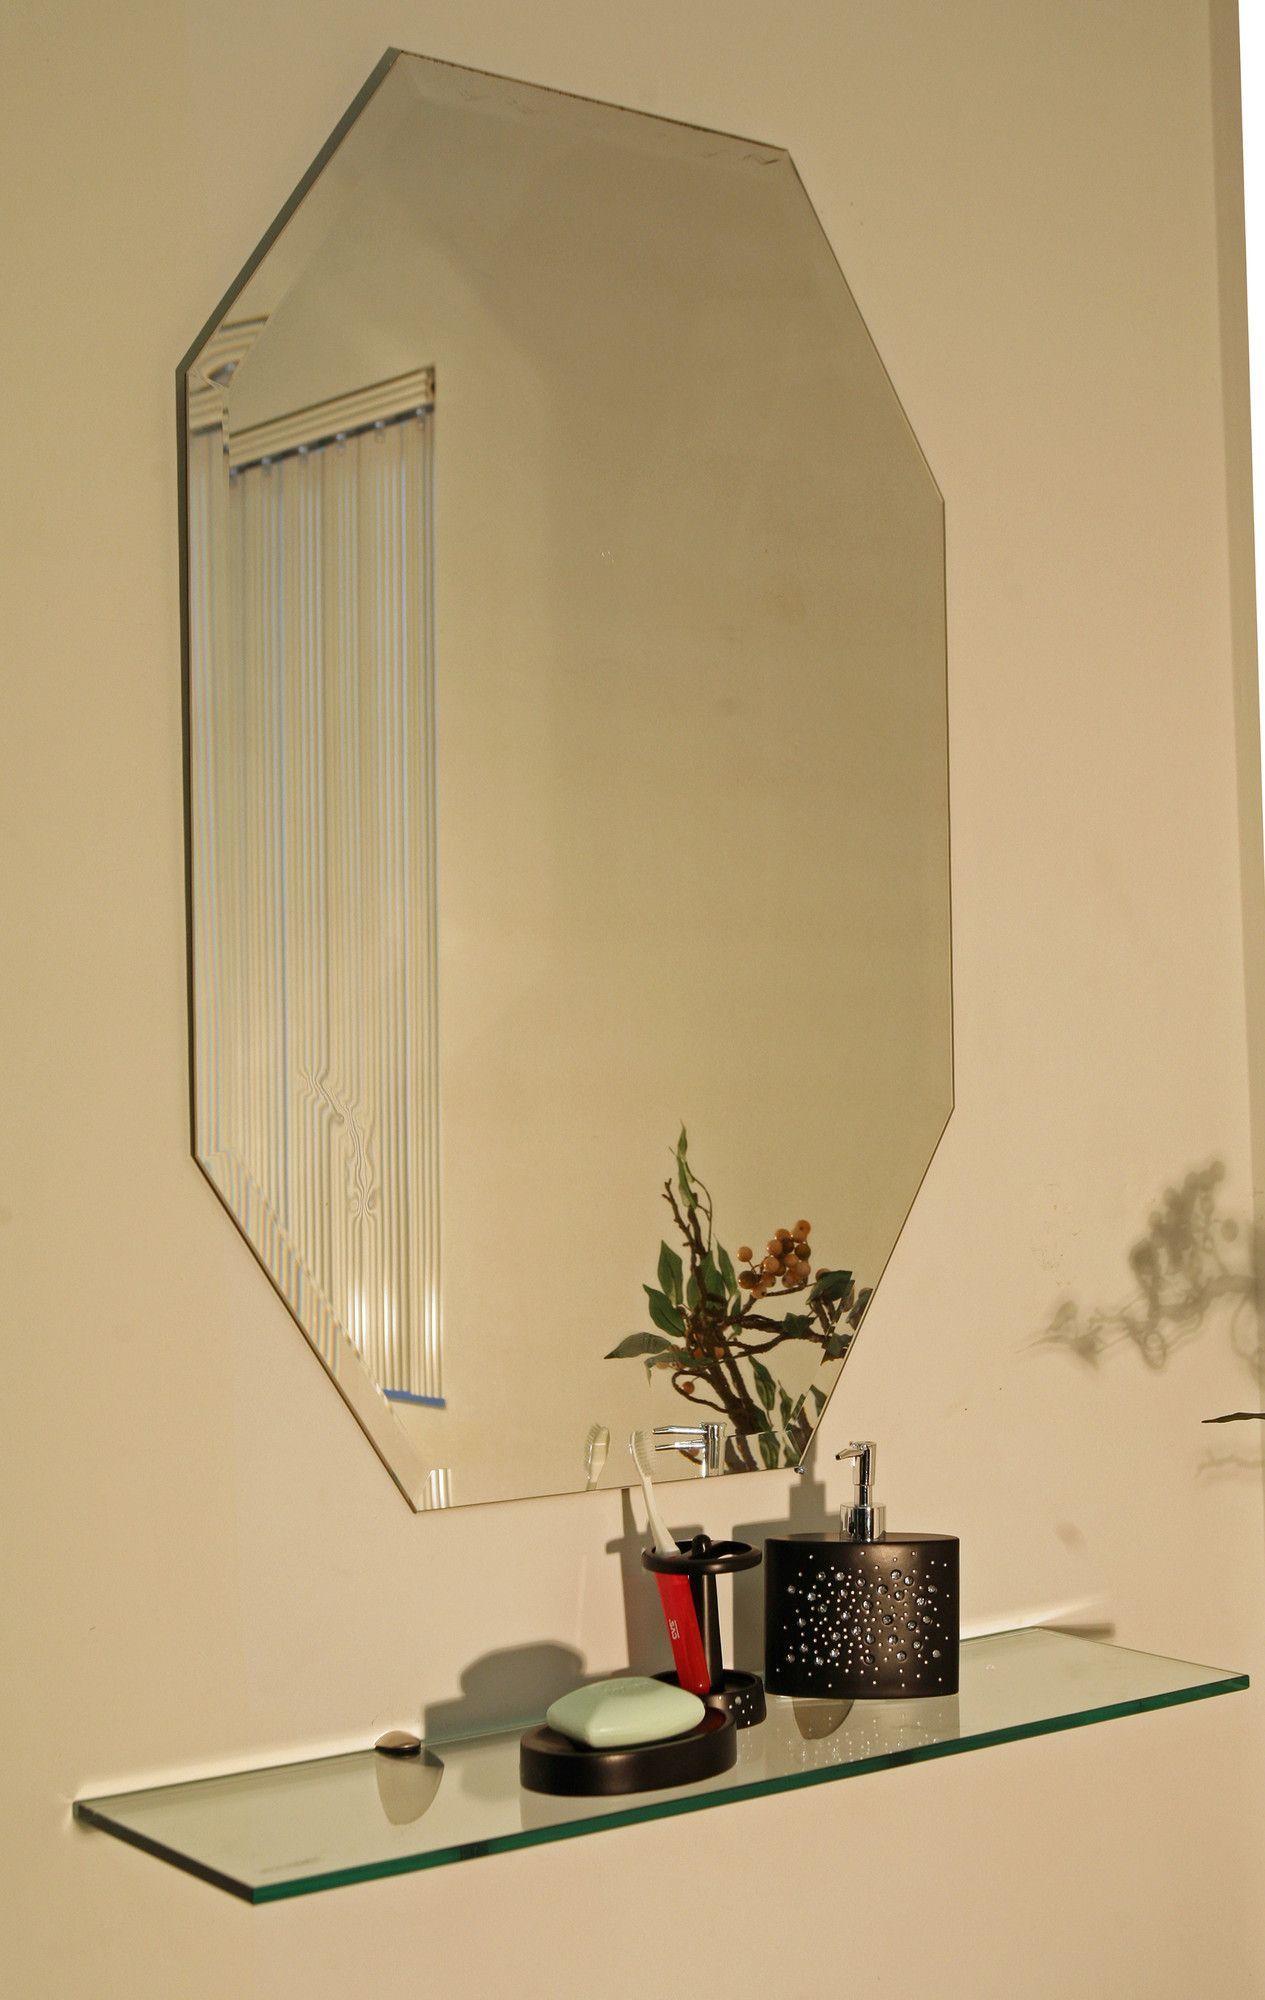 Cromer Frameless Mirror | Products | Pinterest | Frameless mirror ...